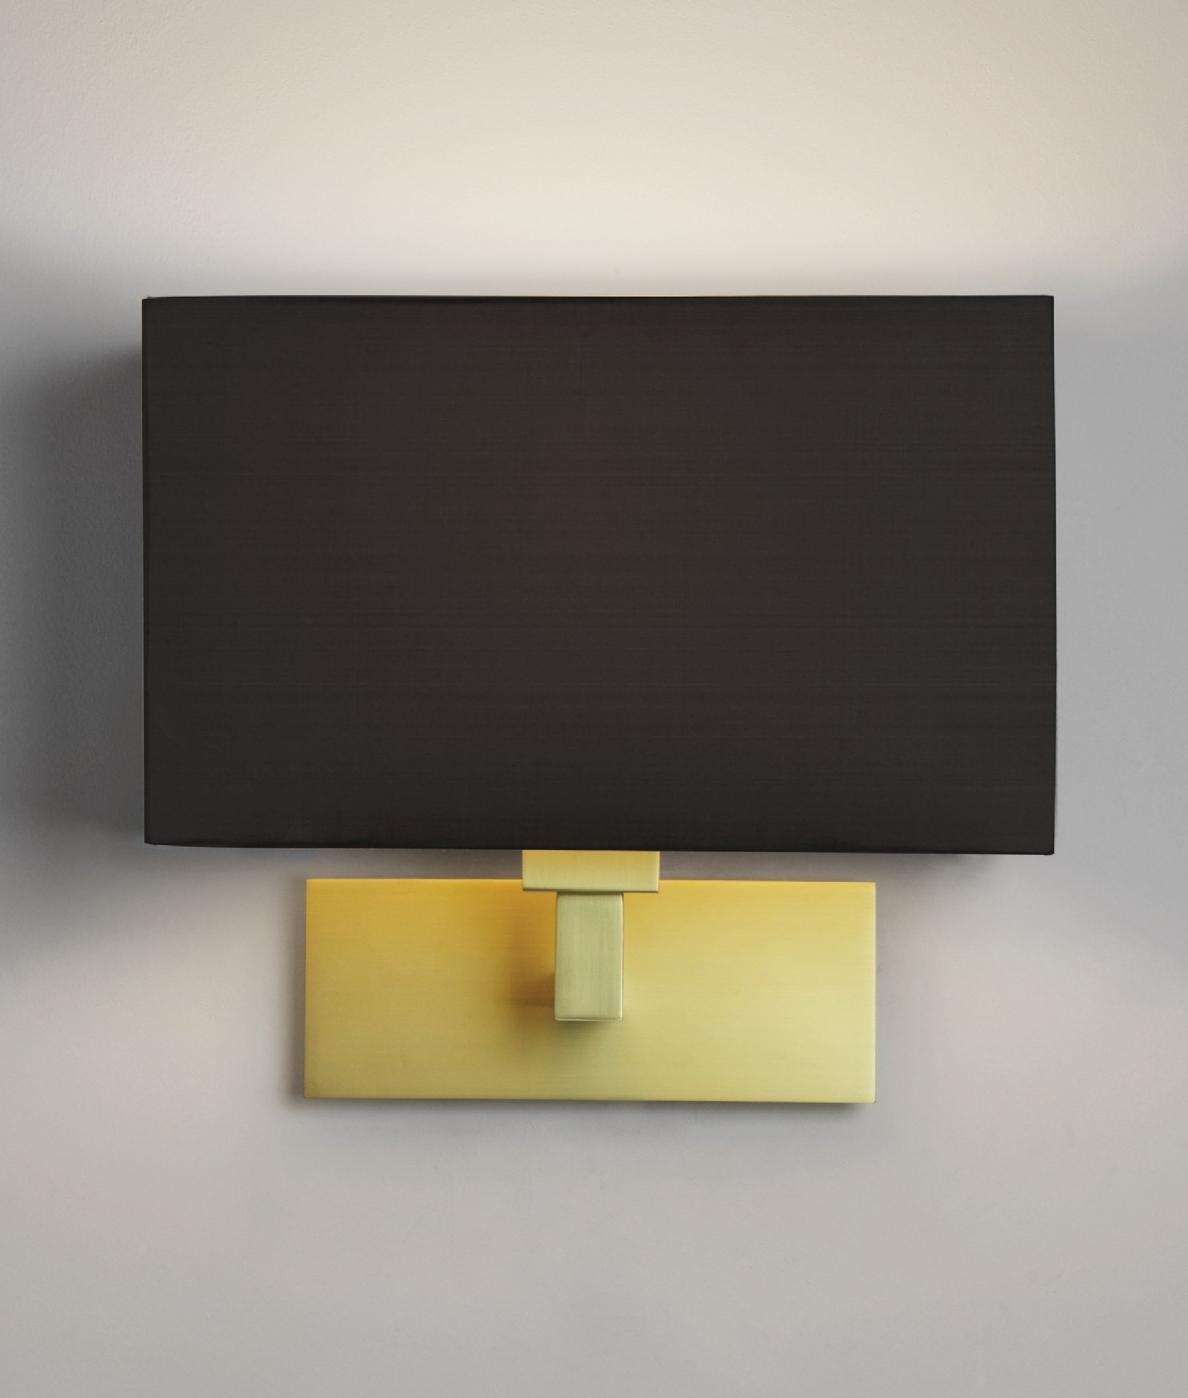 Matt Gold Wall Light And Shade